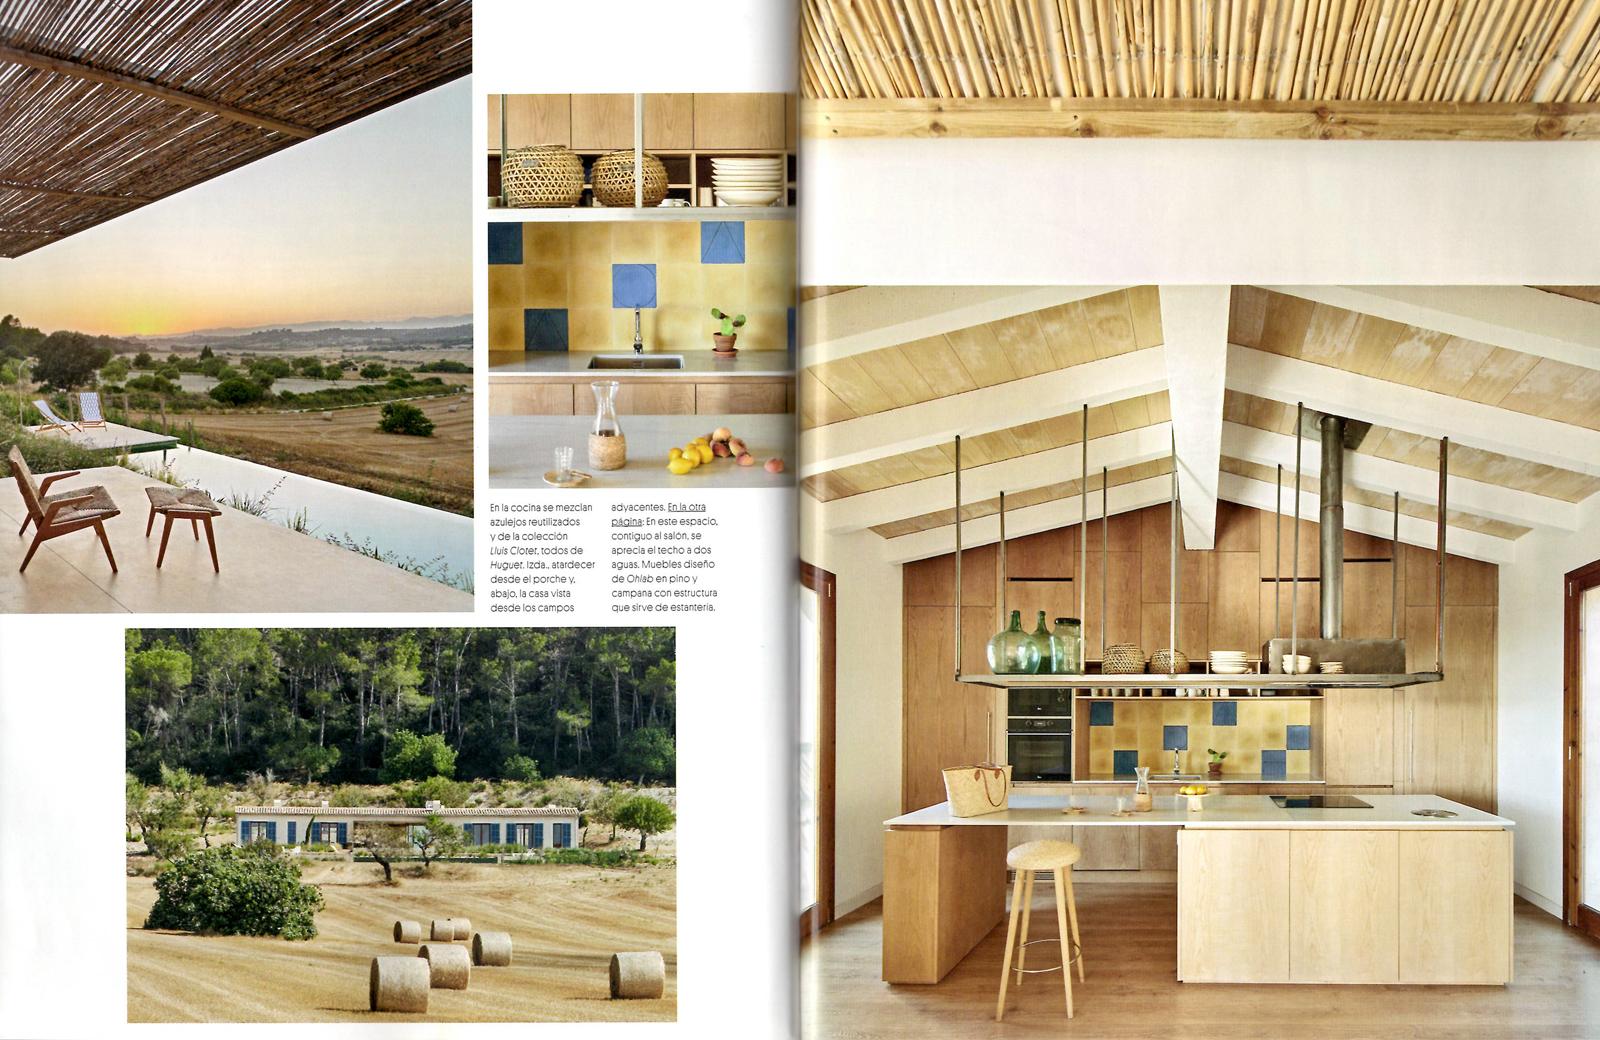 ad-magazine-7-y-8-1600x1040